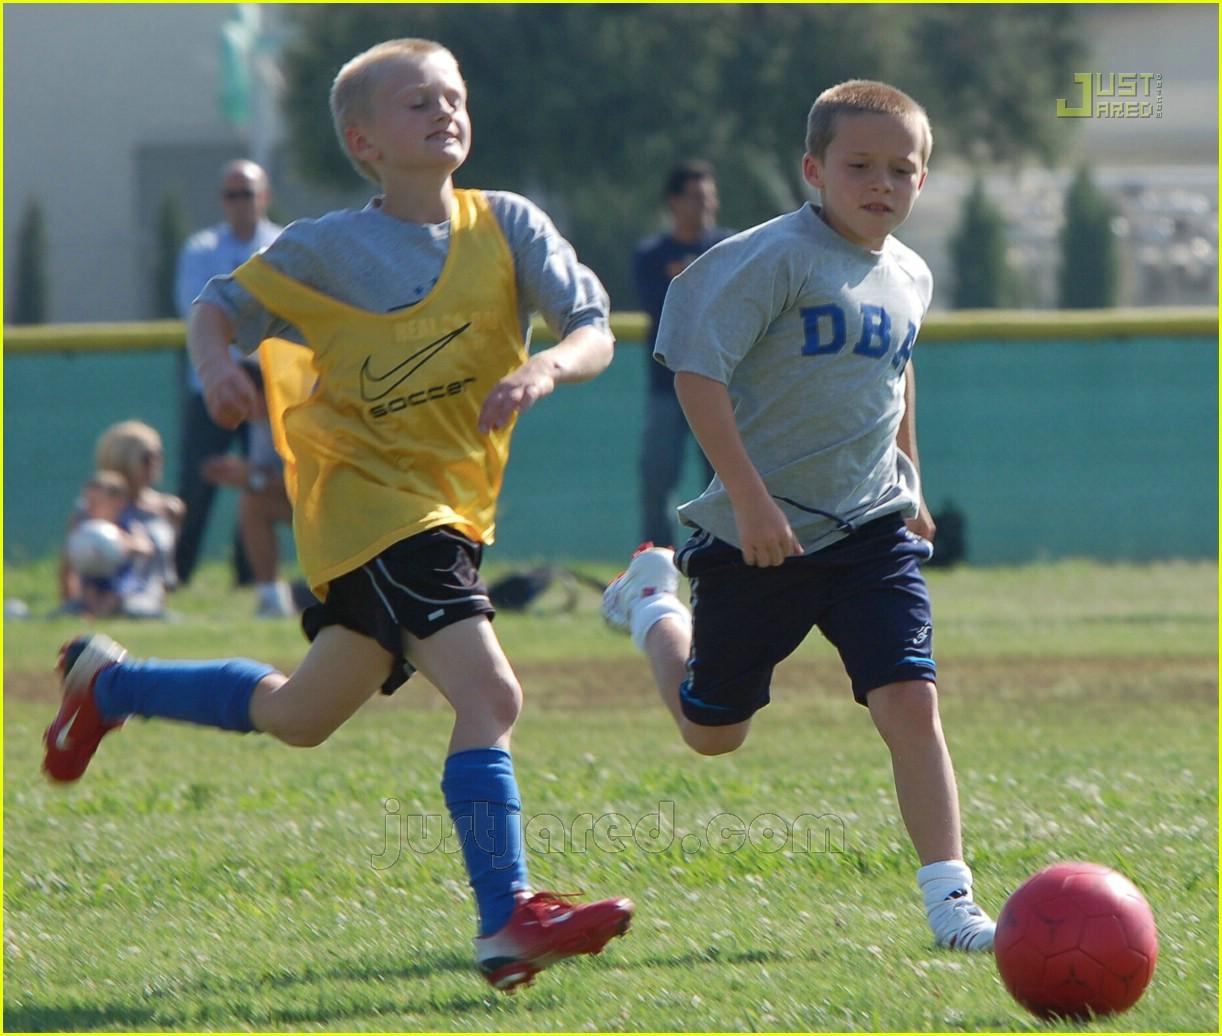 beckham boys soccer practice 09495231